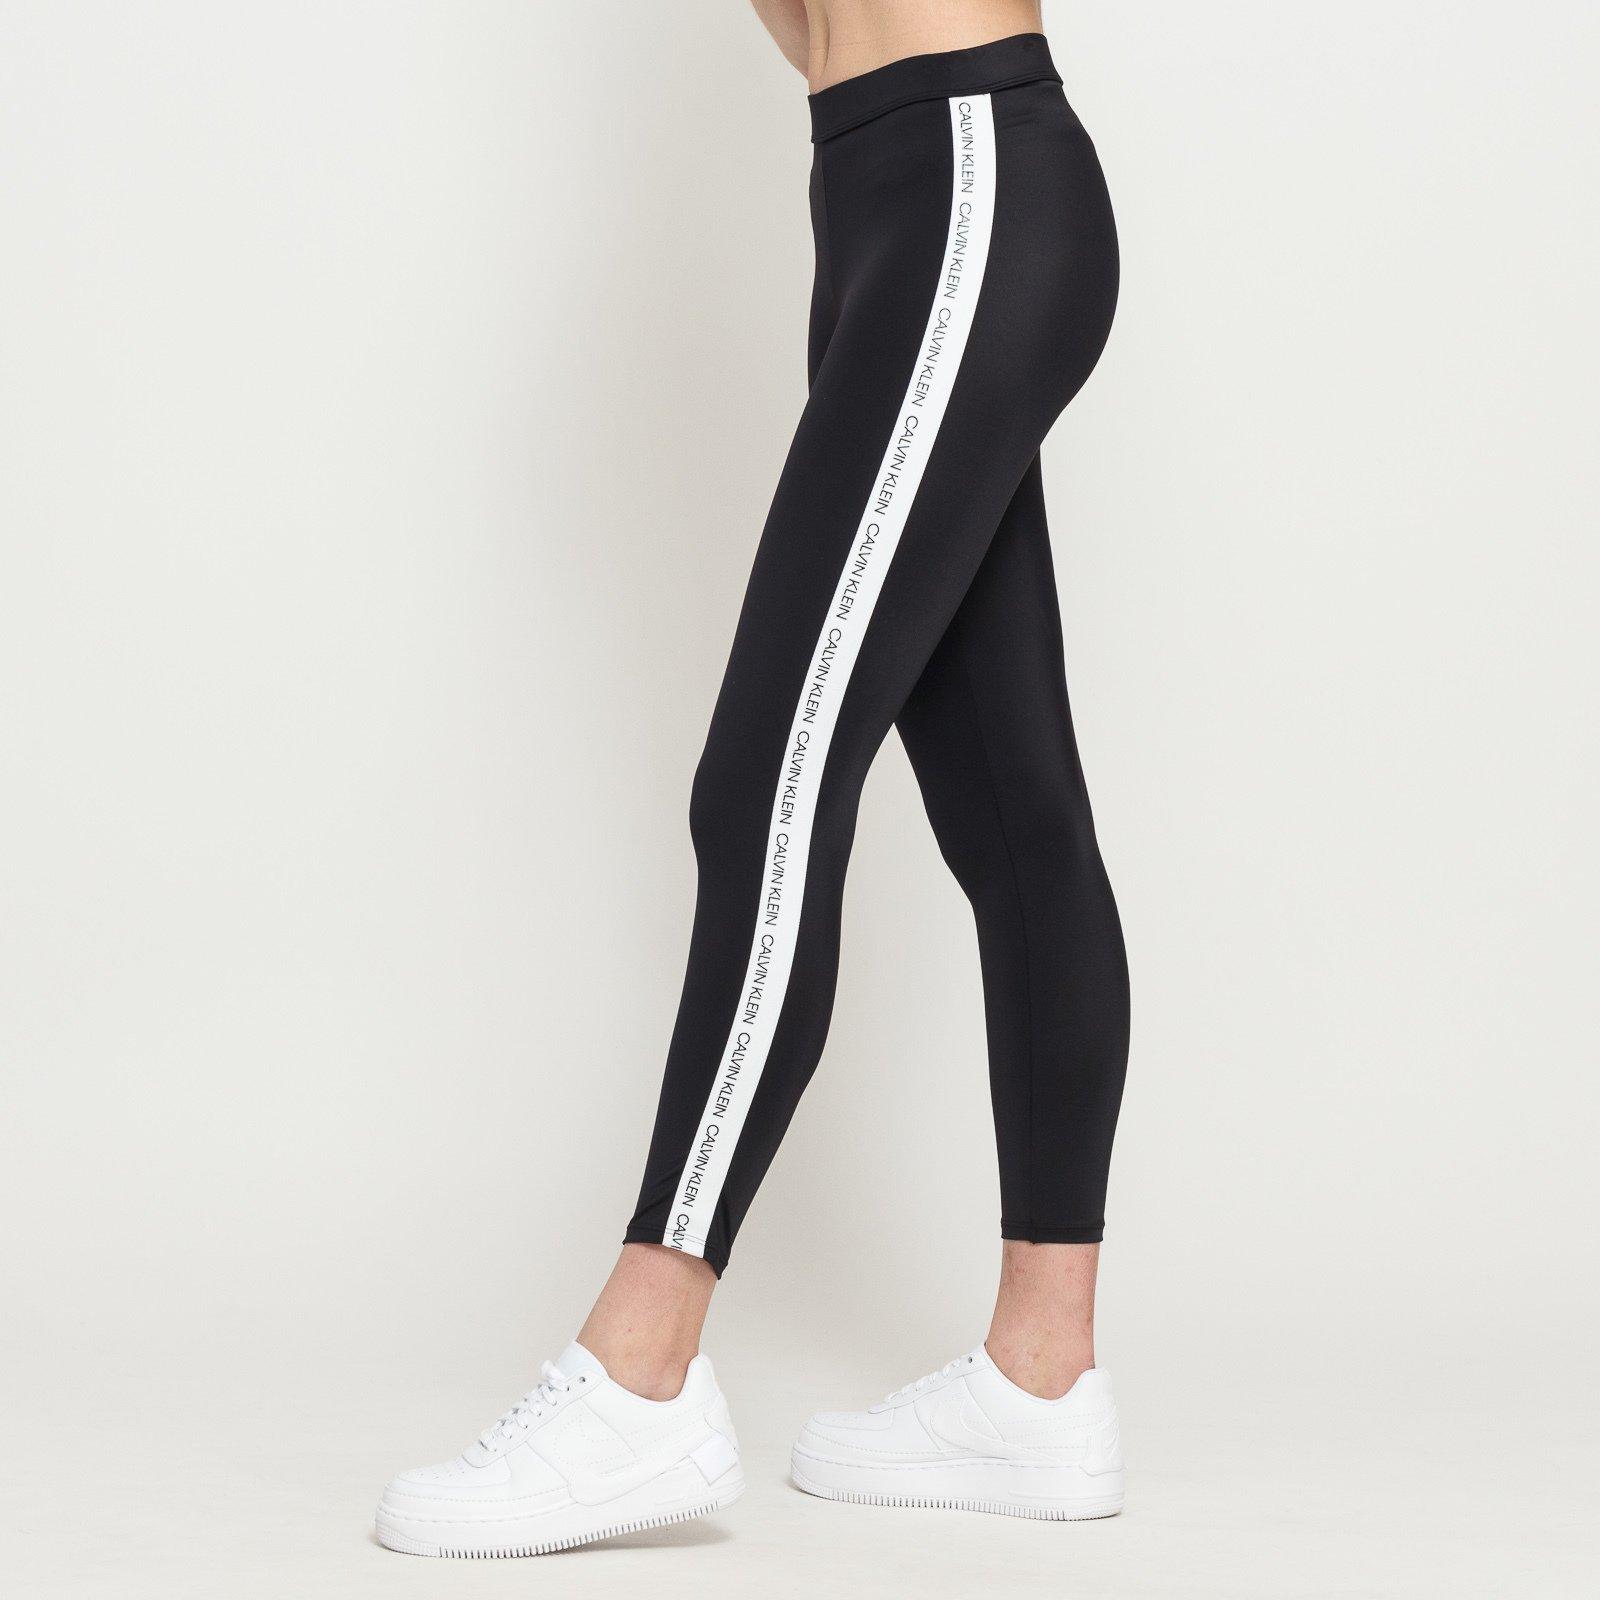 0b7f115362f6 Calvin Klein Waistband Legging čierne   biele - Glami.sk